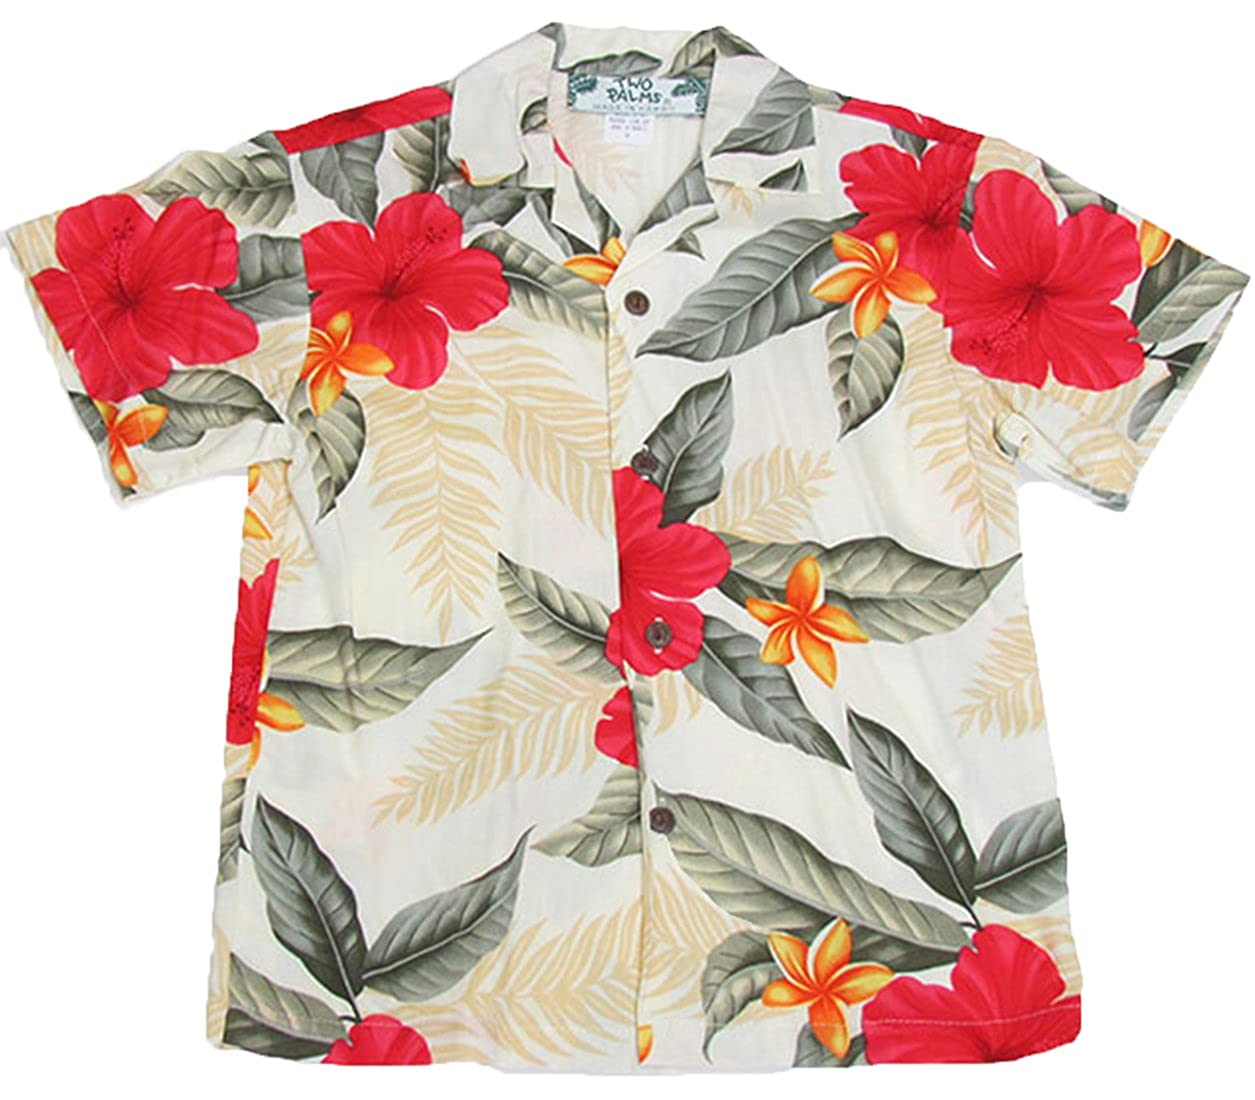 Two Palms Boys Leilani Rayon Shirt